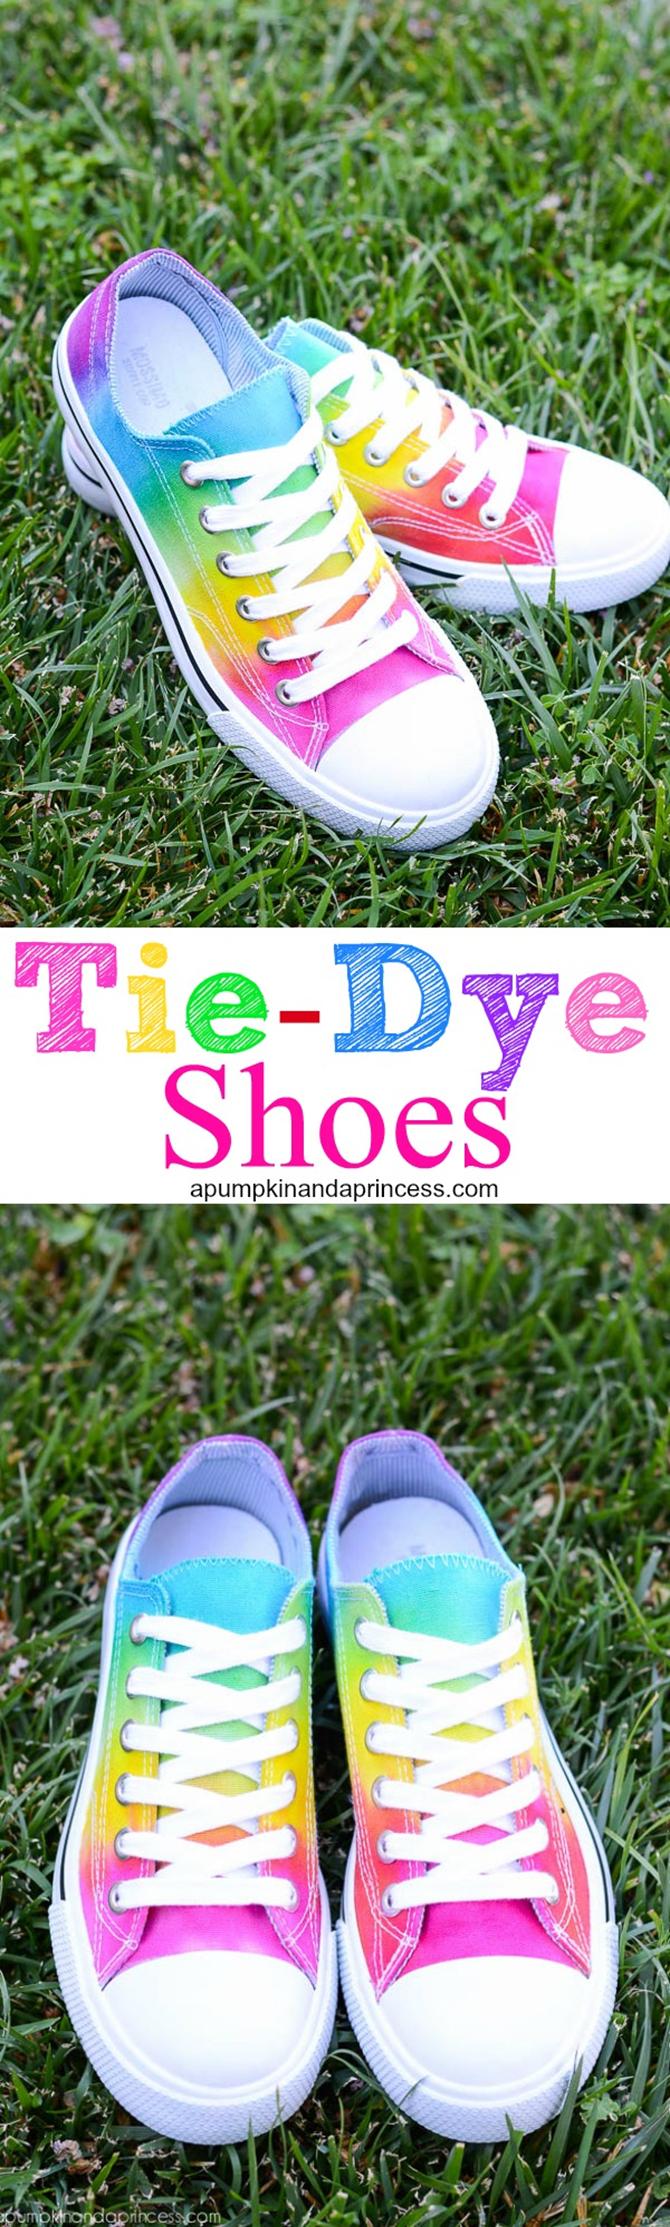 DIY Tennis Shoes - Tie Dye - EverythingEtsy